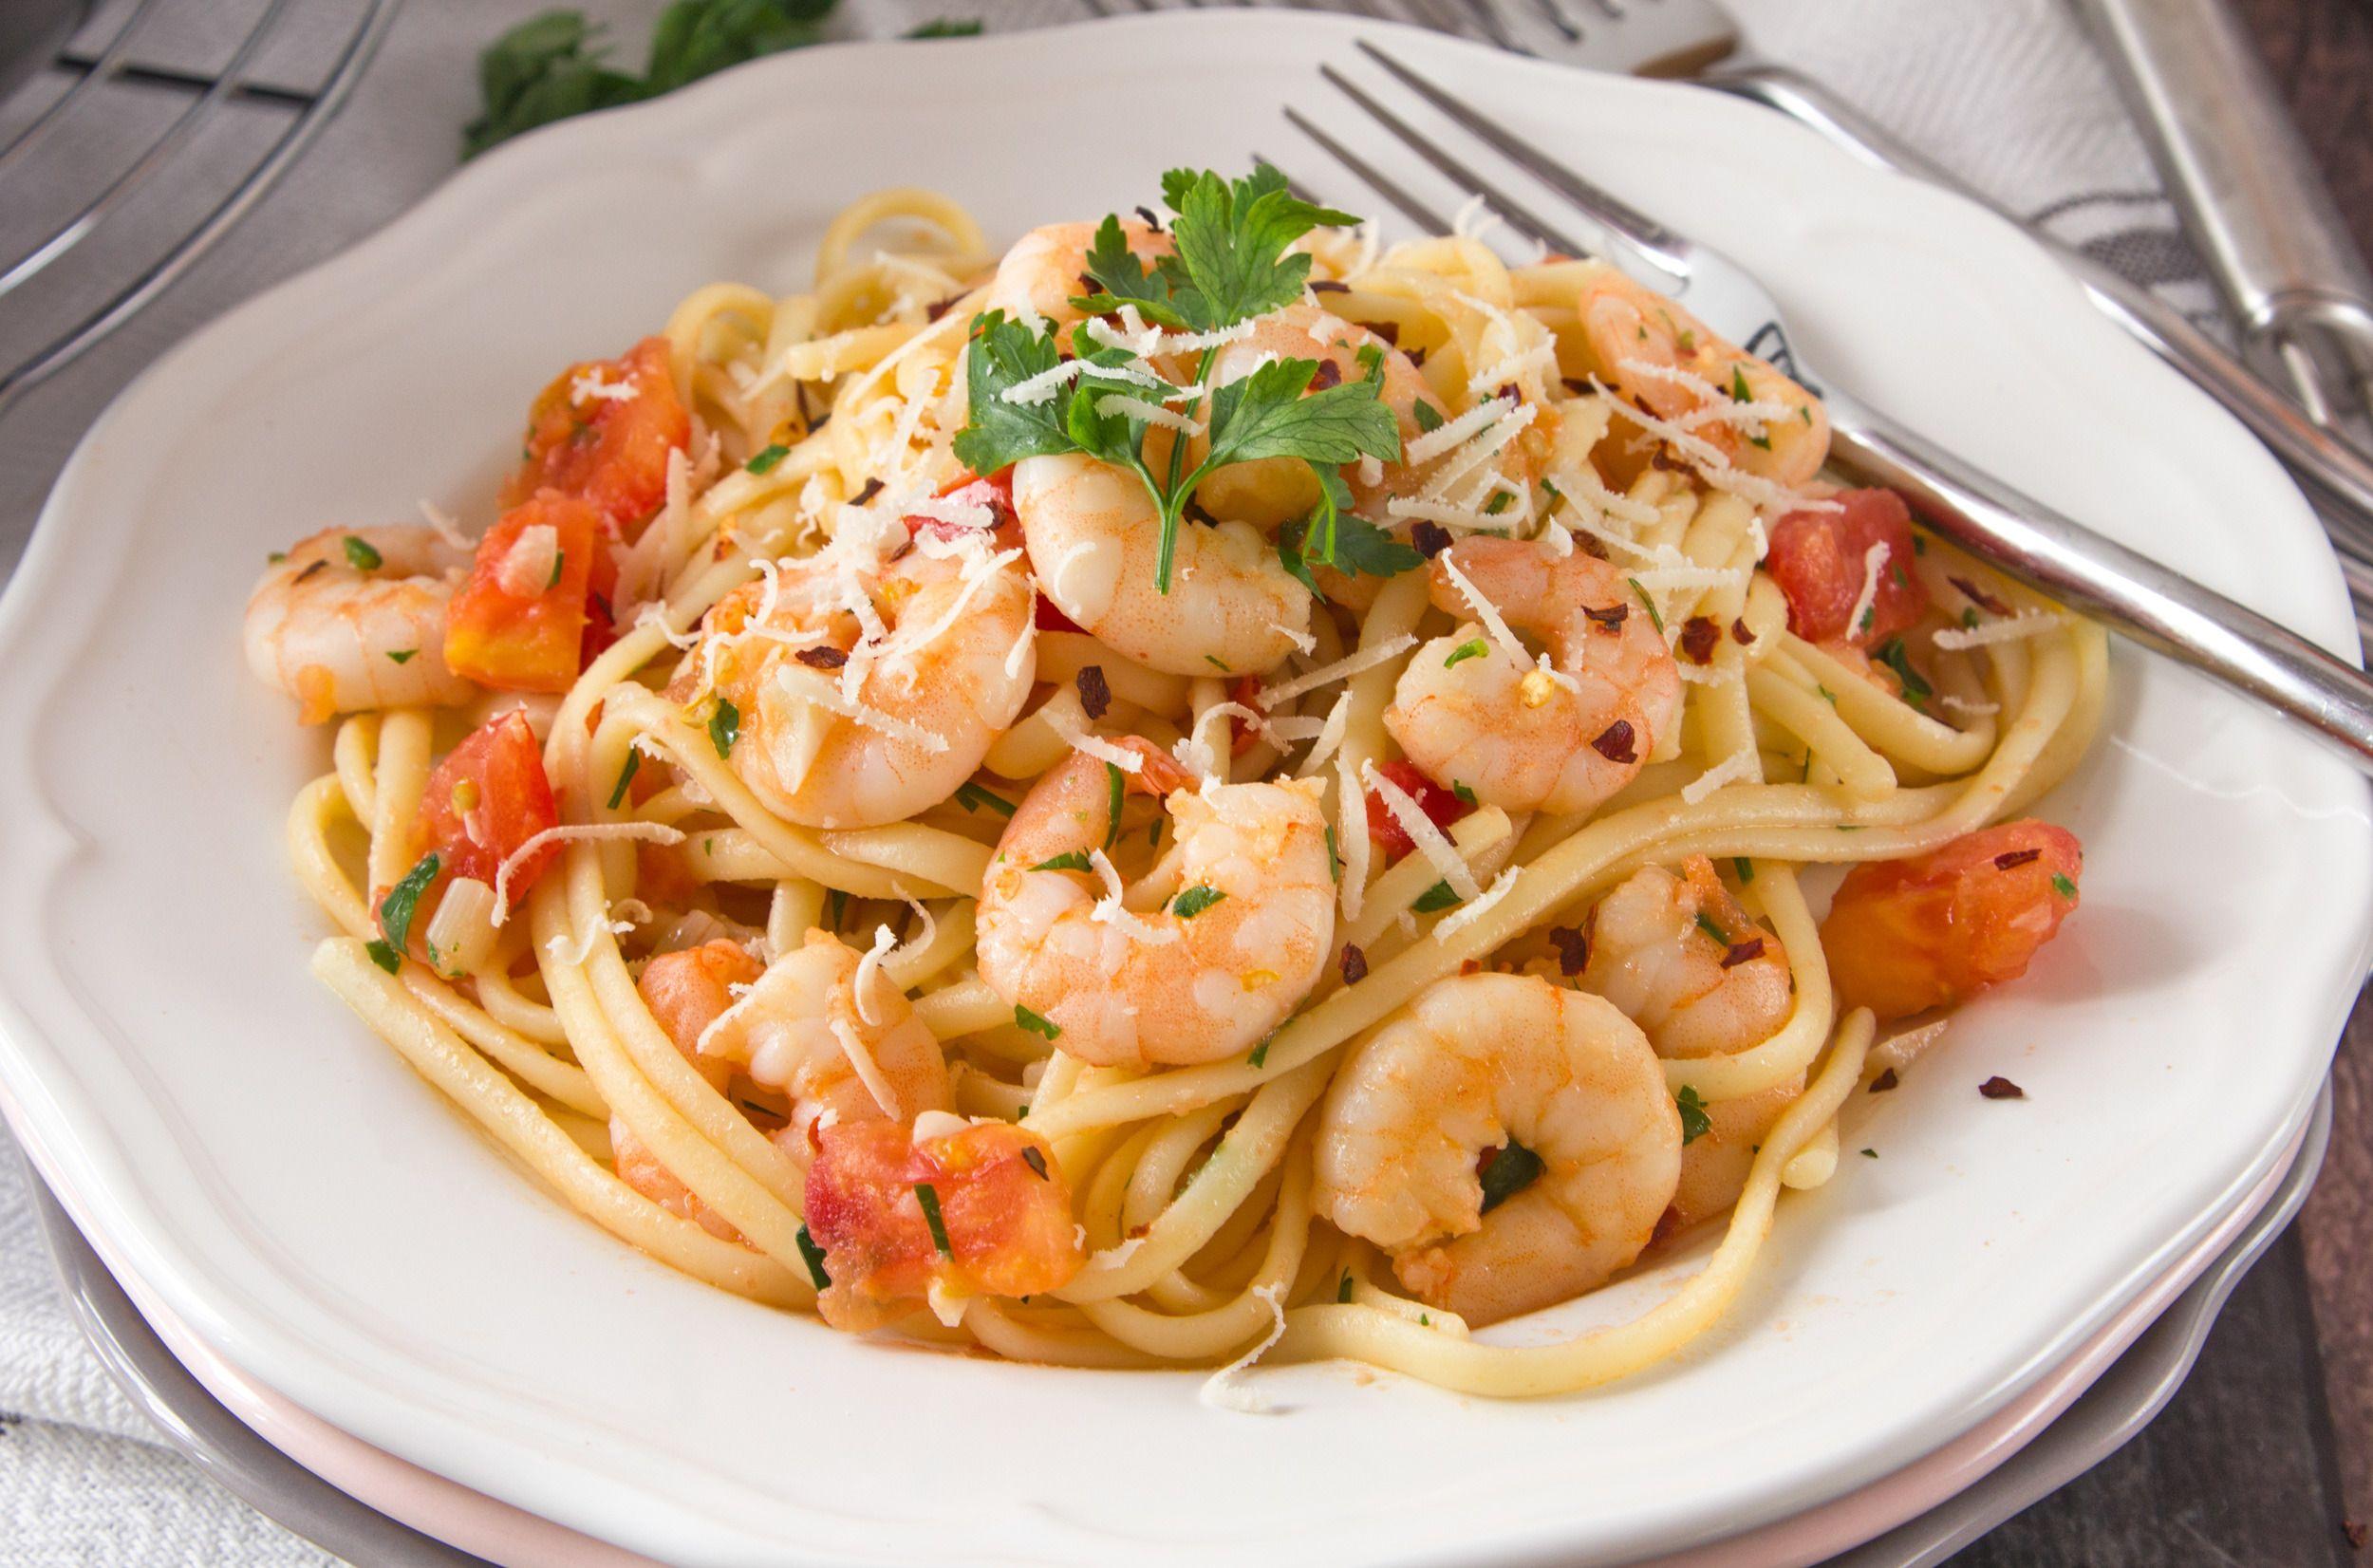 Best shrimp recipes mariscos best shrimp recipes forumfinder Image collections